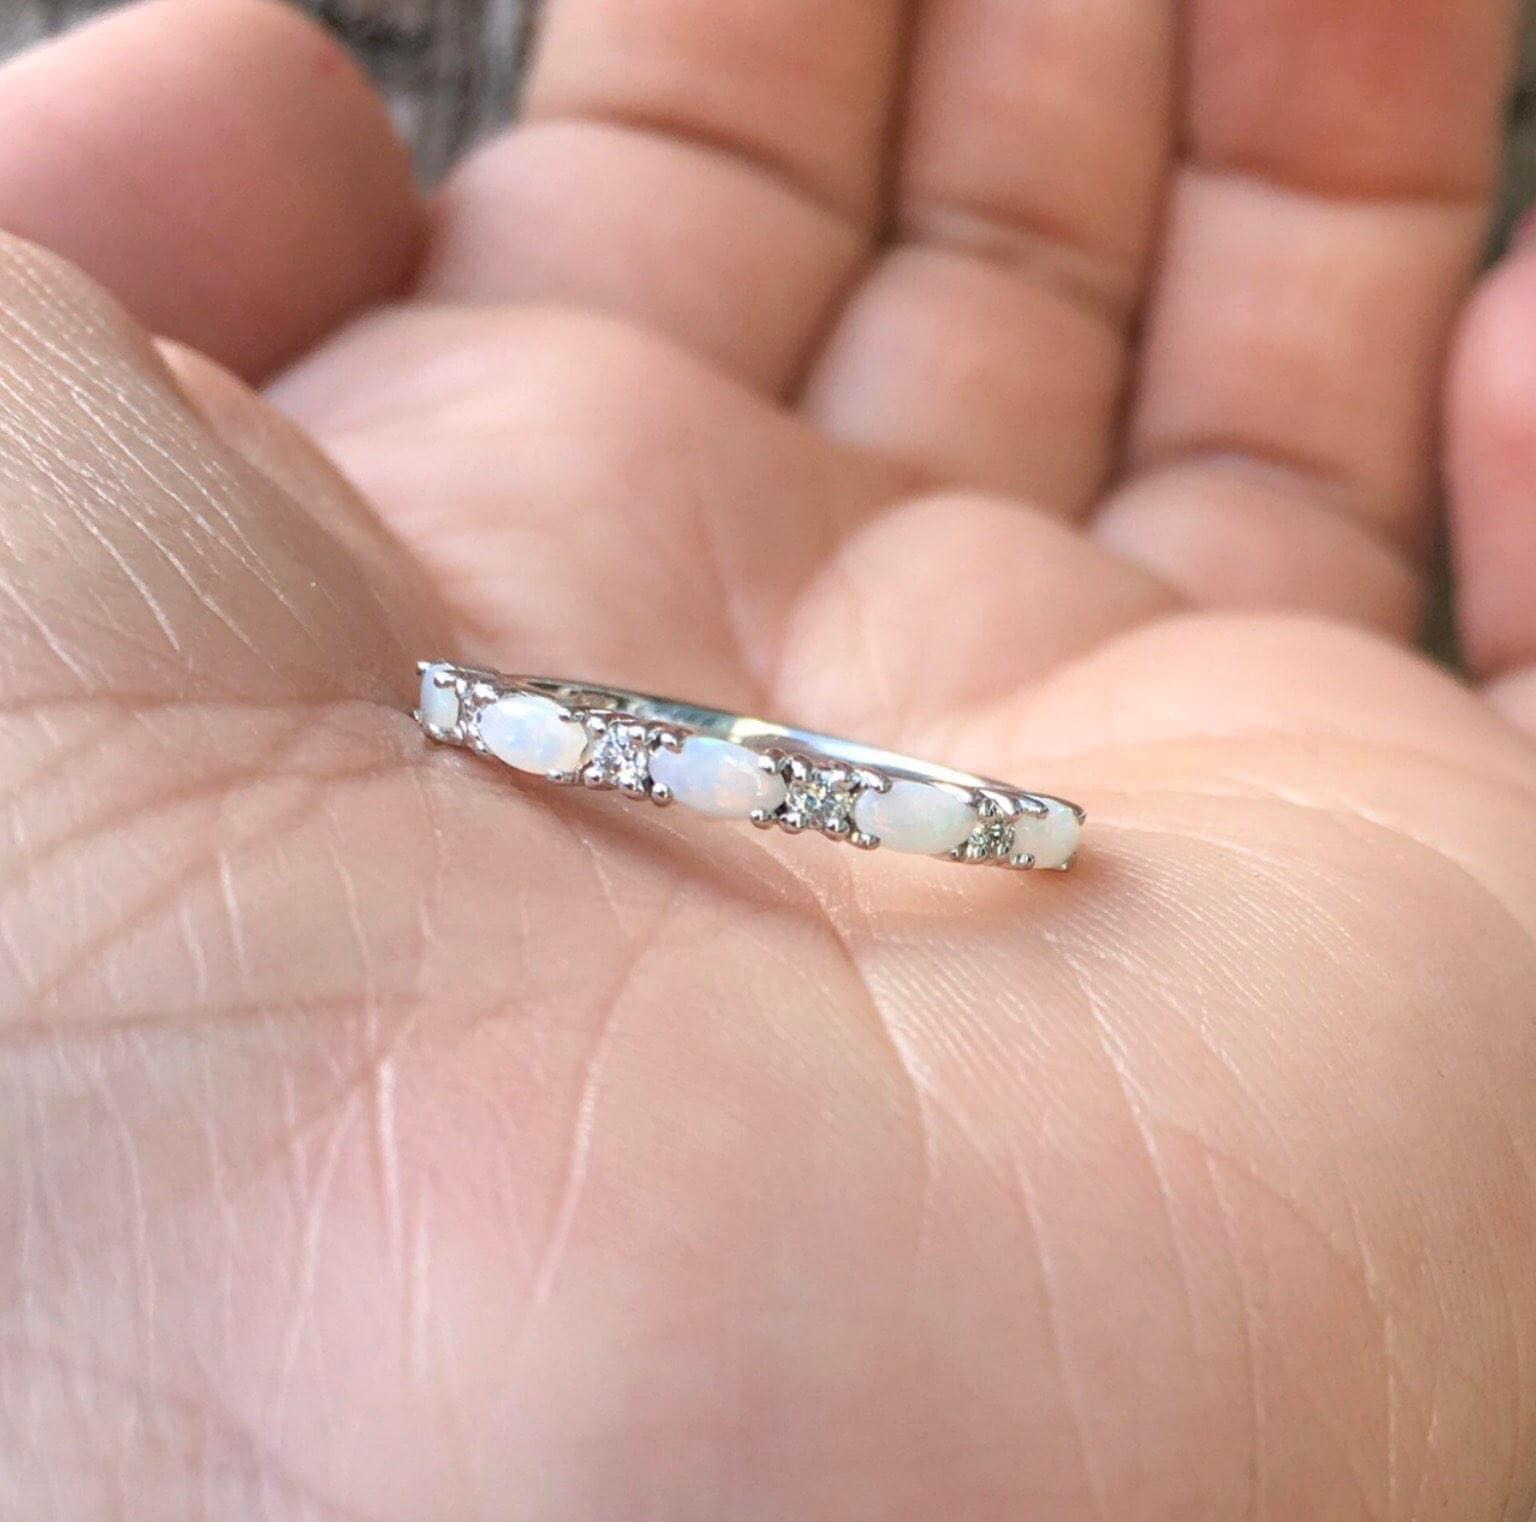 Opal Ring Simple Diamond Opal Wedding Band Matching Opal Ring   Etsy